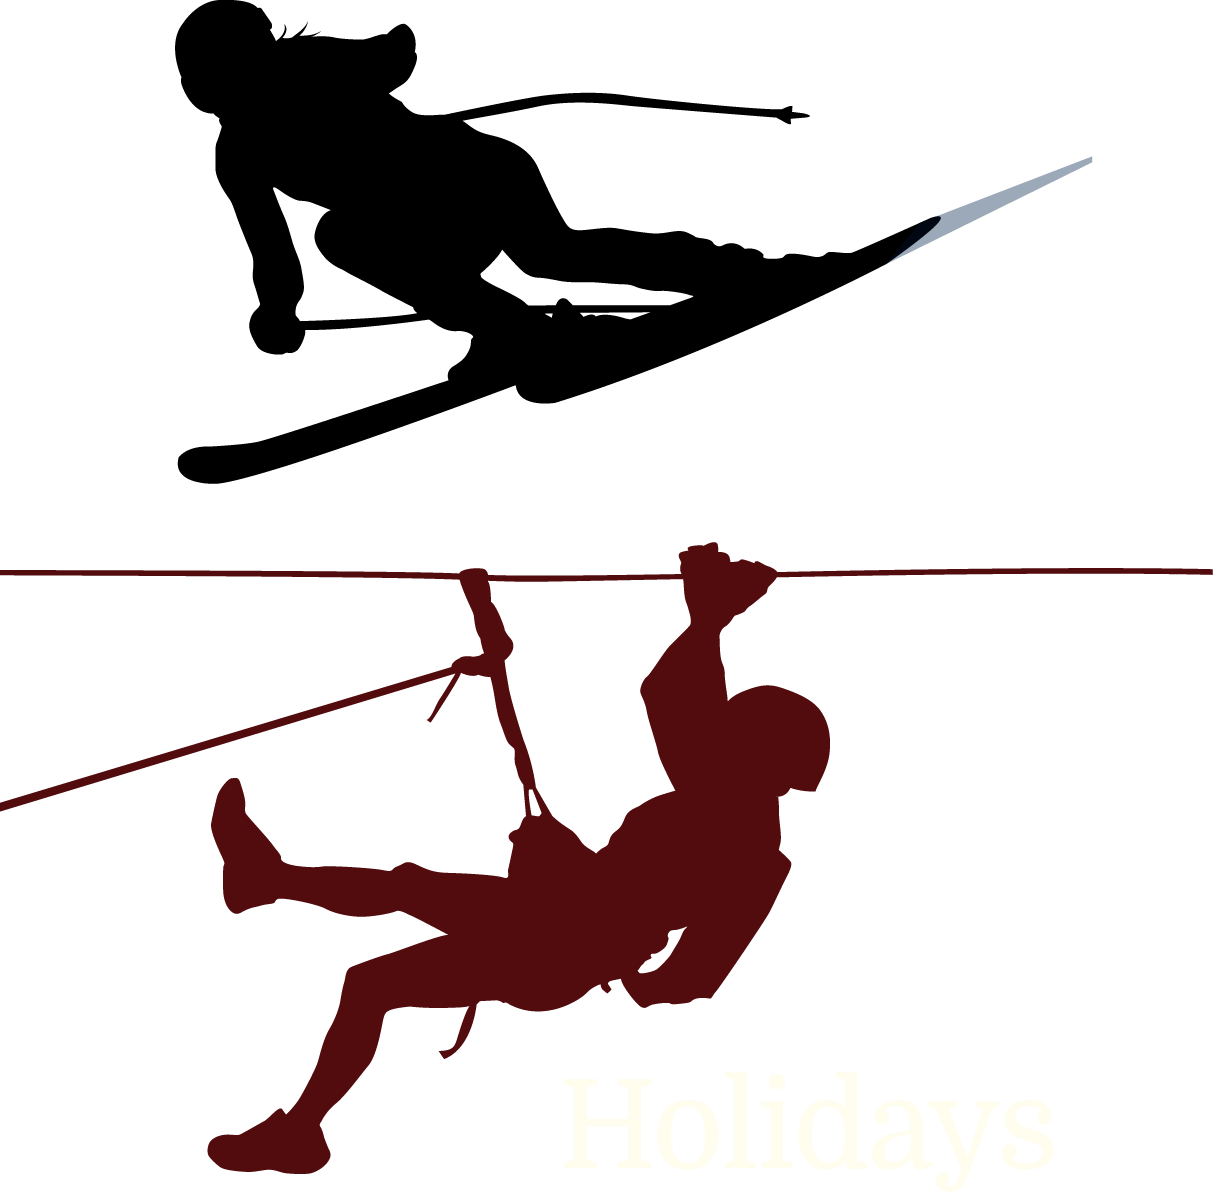 Climbing mountaineering clip art. Skis clipart ski jump